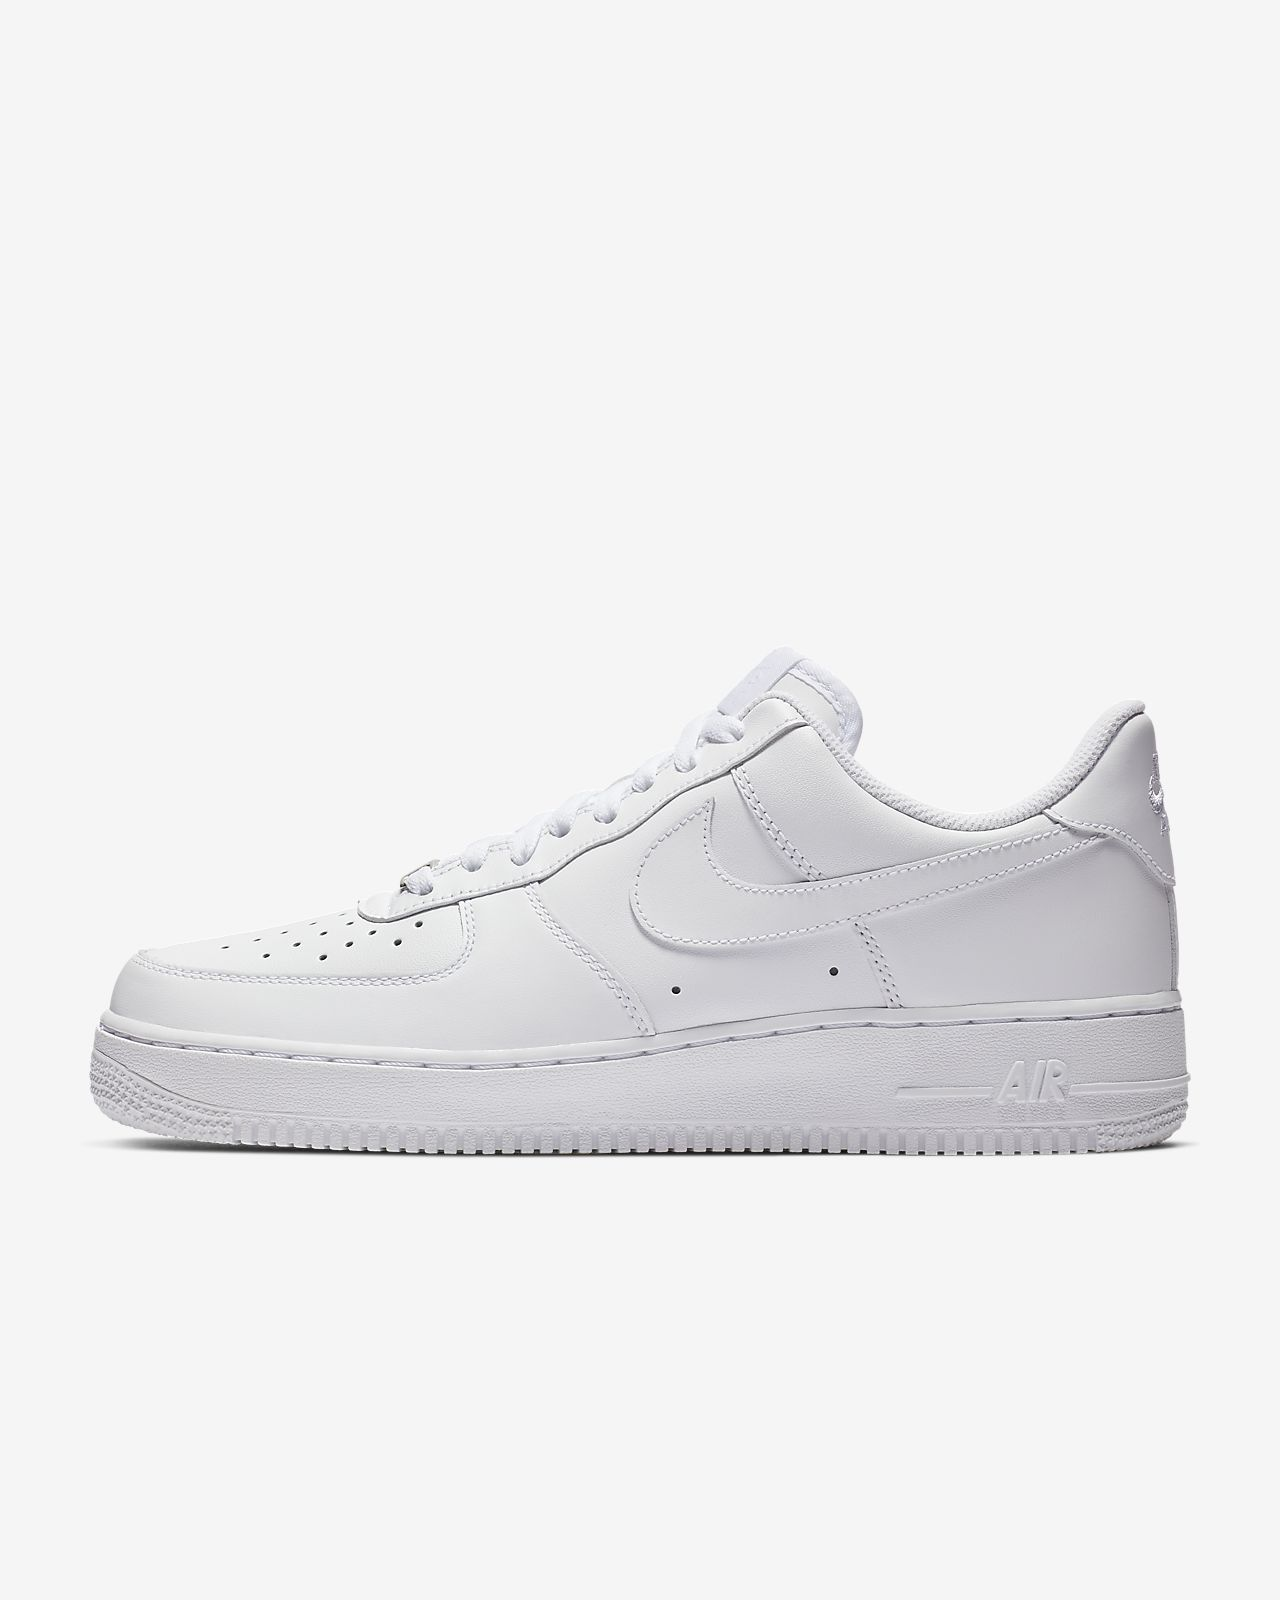 Nike Air Force 1 '07 Triple White Women's Shoe